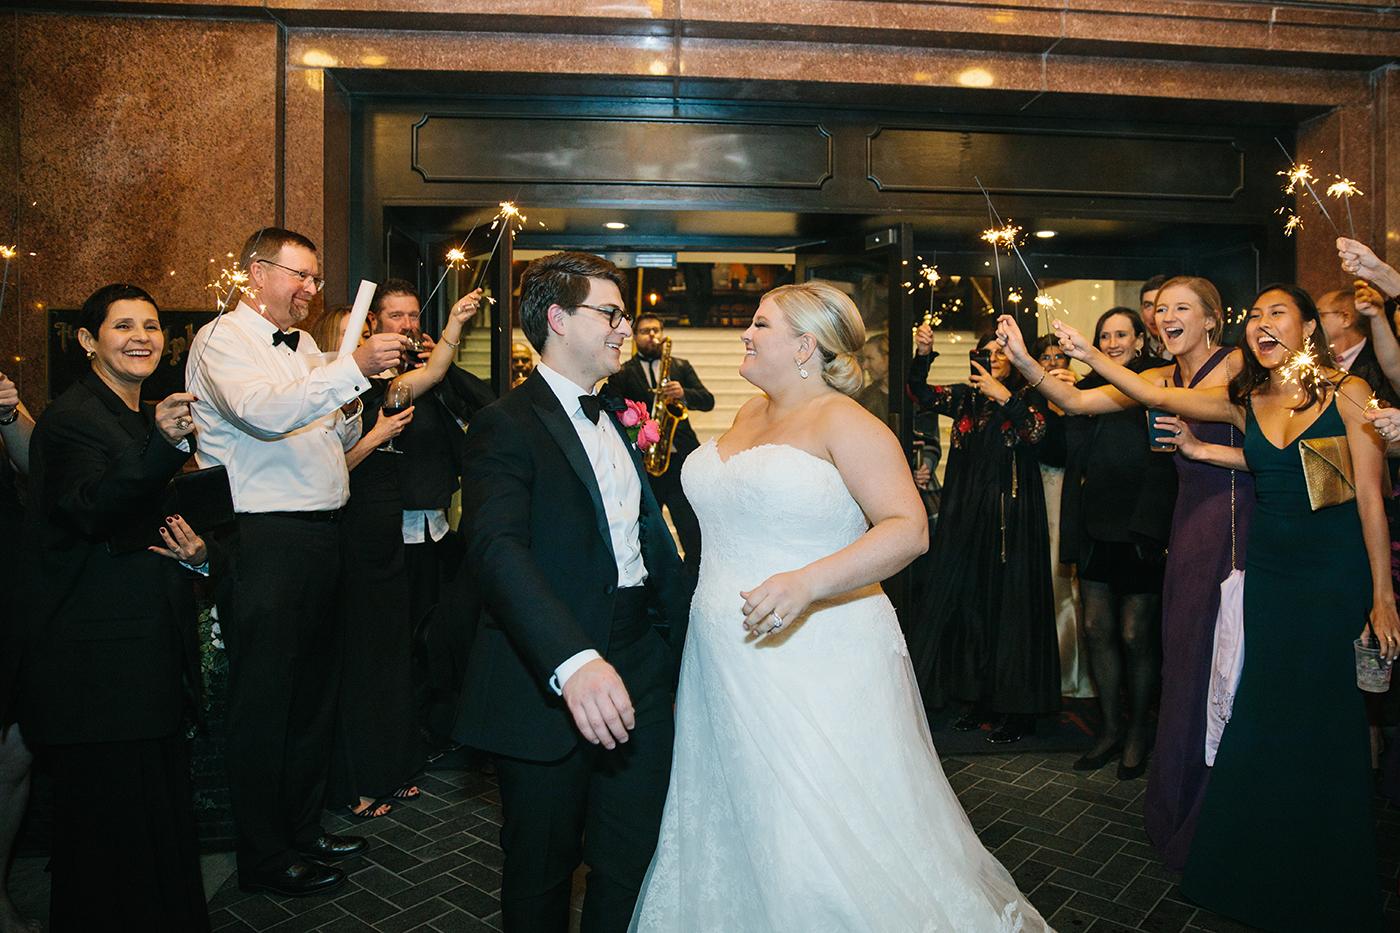 Dallas Weddings Planner - Allday Events - Katie + Matthew at The Adolphus Hotel - 722.jpg